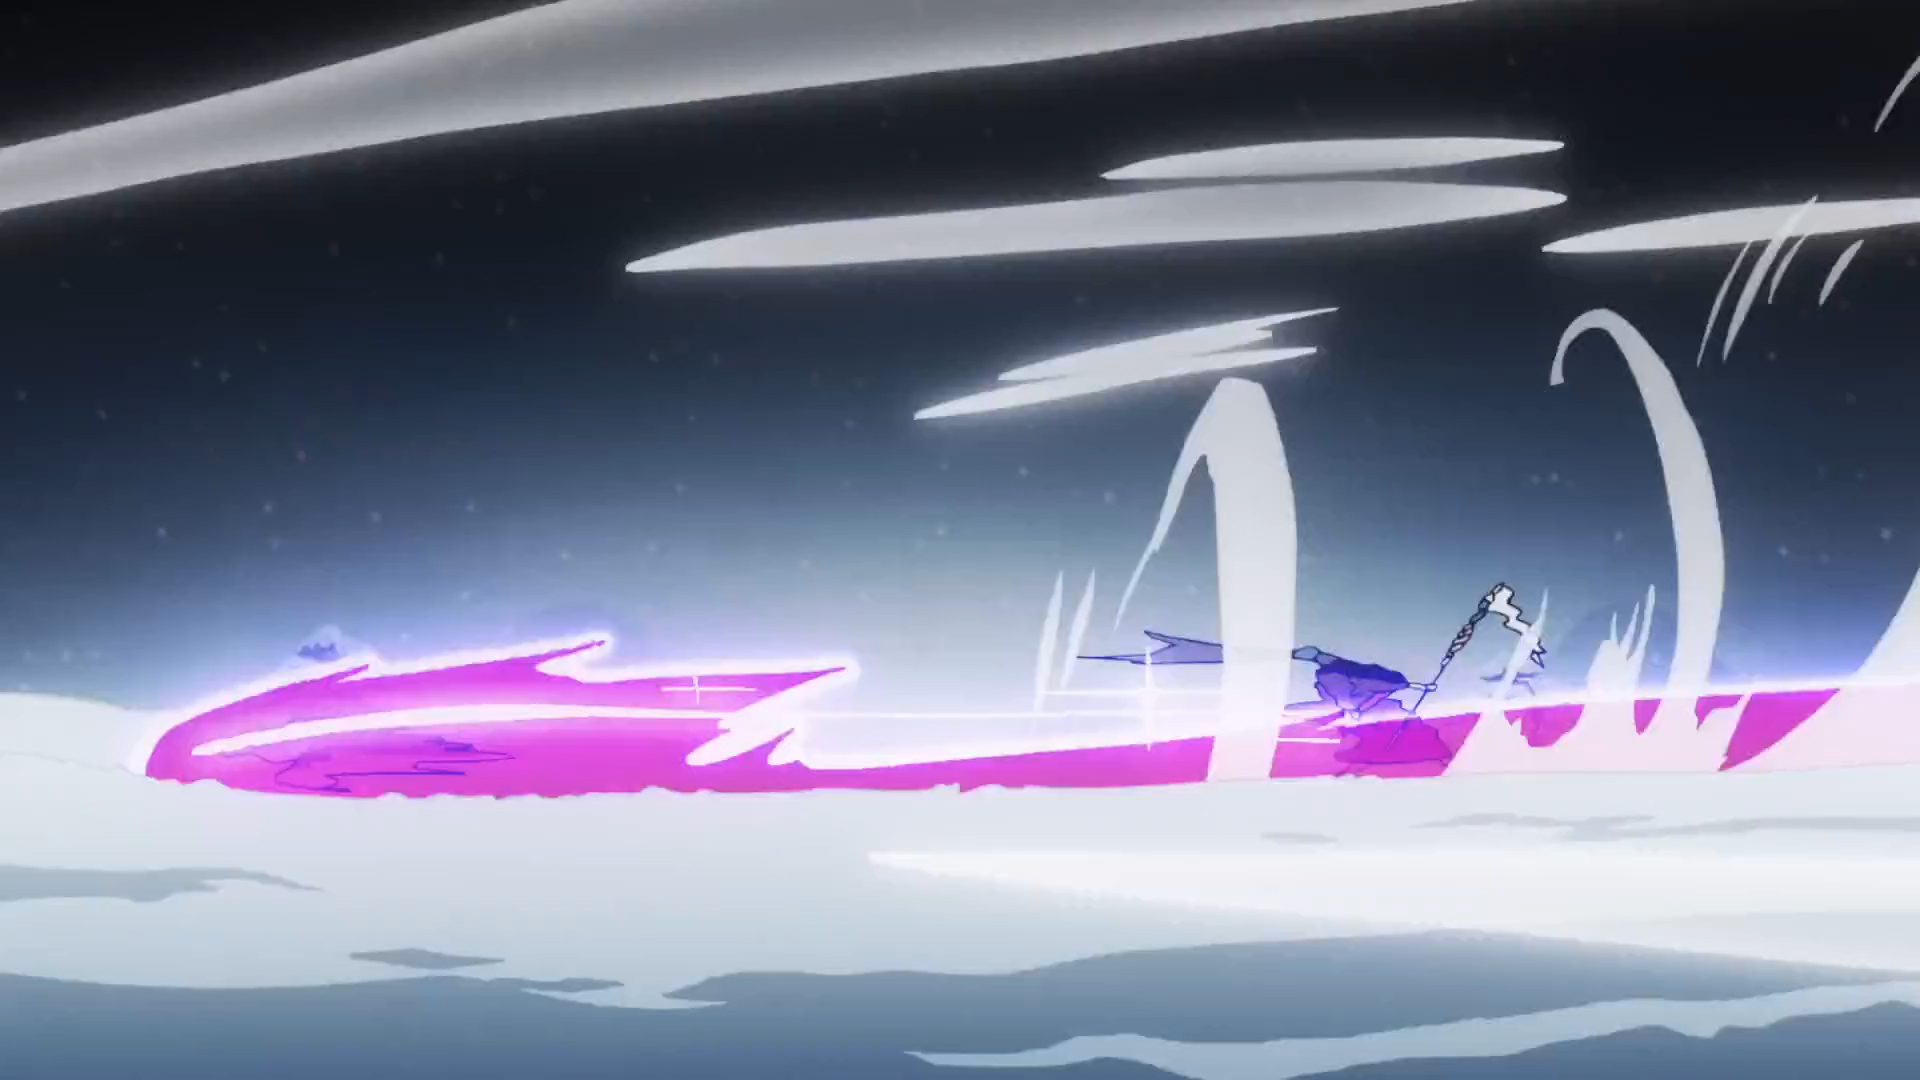 Anime Trending On Twitter Three Sword Style Purgatory Onigiri Source One Piece Episode 934